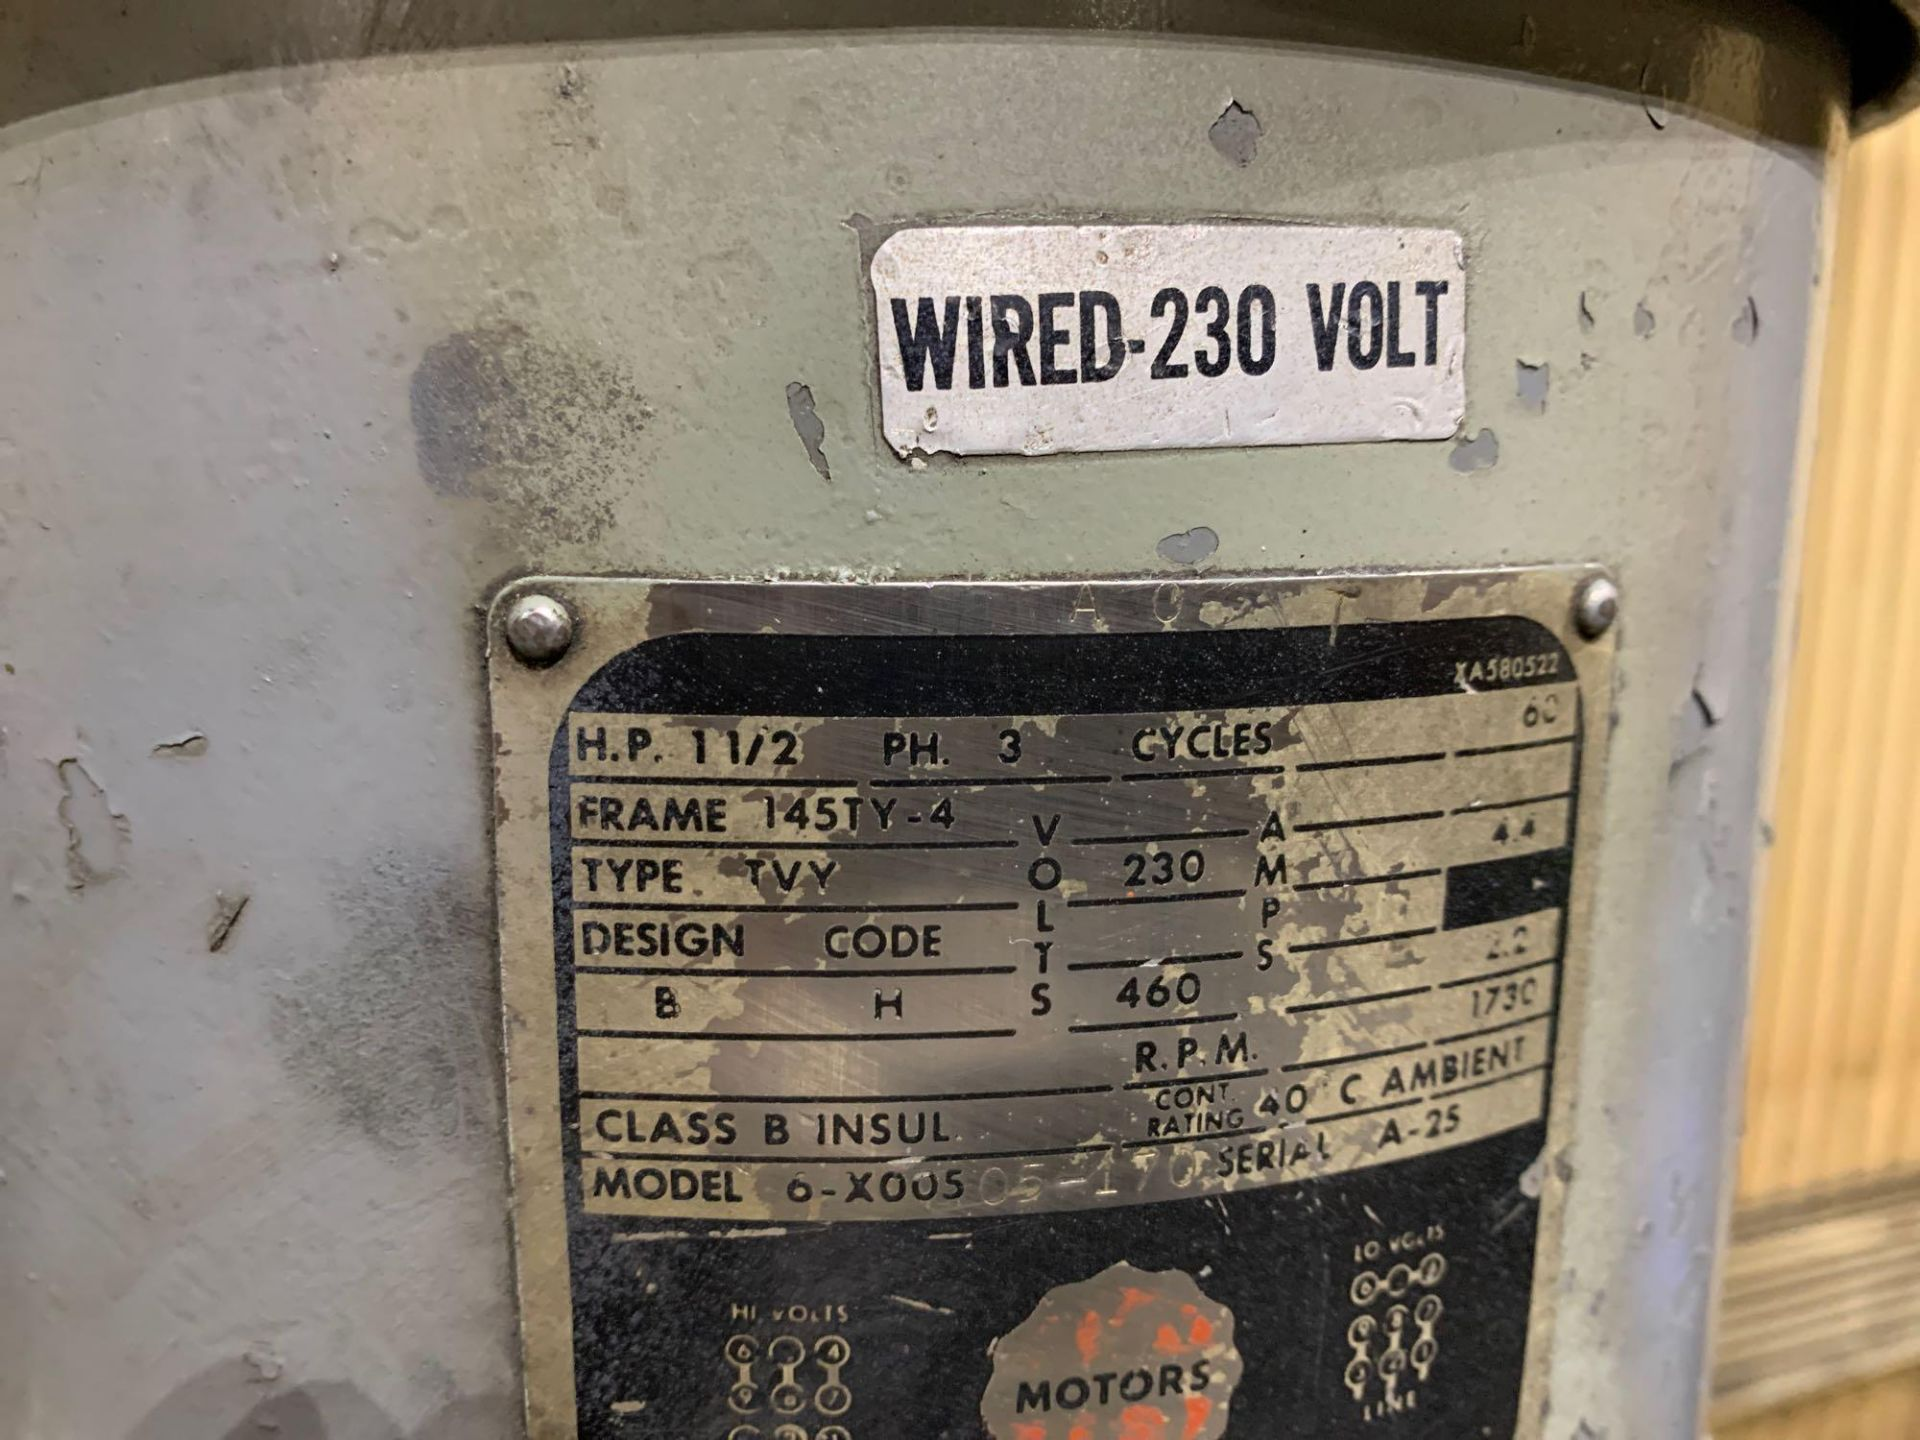 "Bridgeport 2J Vertical Milling Machine Variable Speed Head S/N 132833 CAPACITIES Table size: 9"" X 42 - Image 10 of 12"